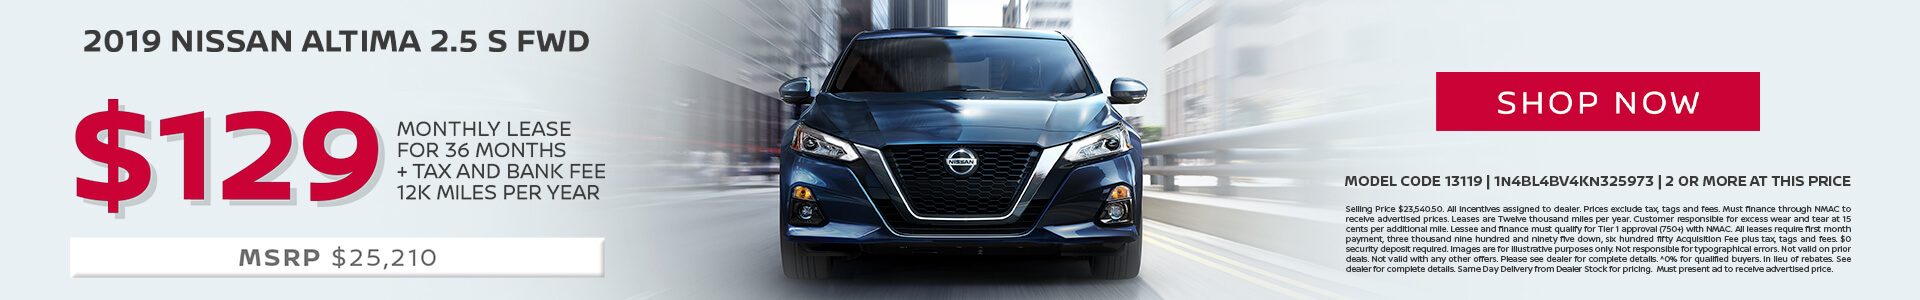 Nissan Altima $129 Lease